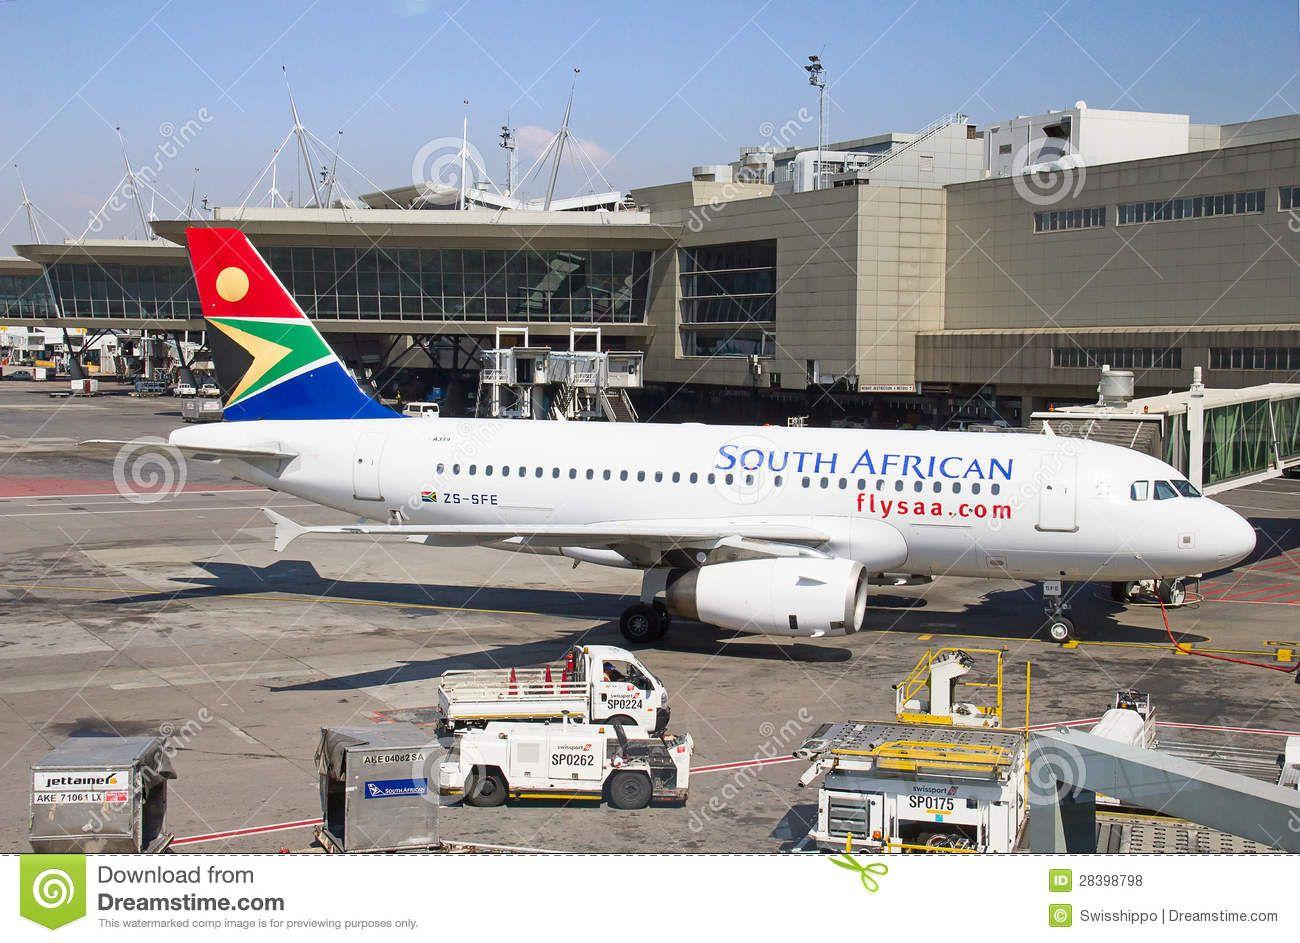 Aeroporto Johannesburg : Tambo airport johannesburg international